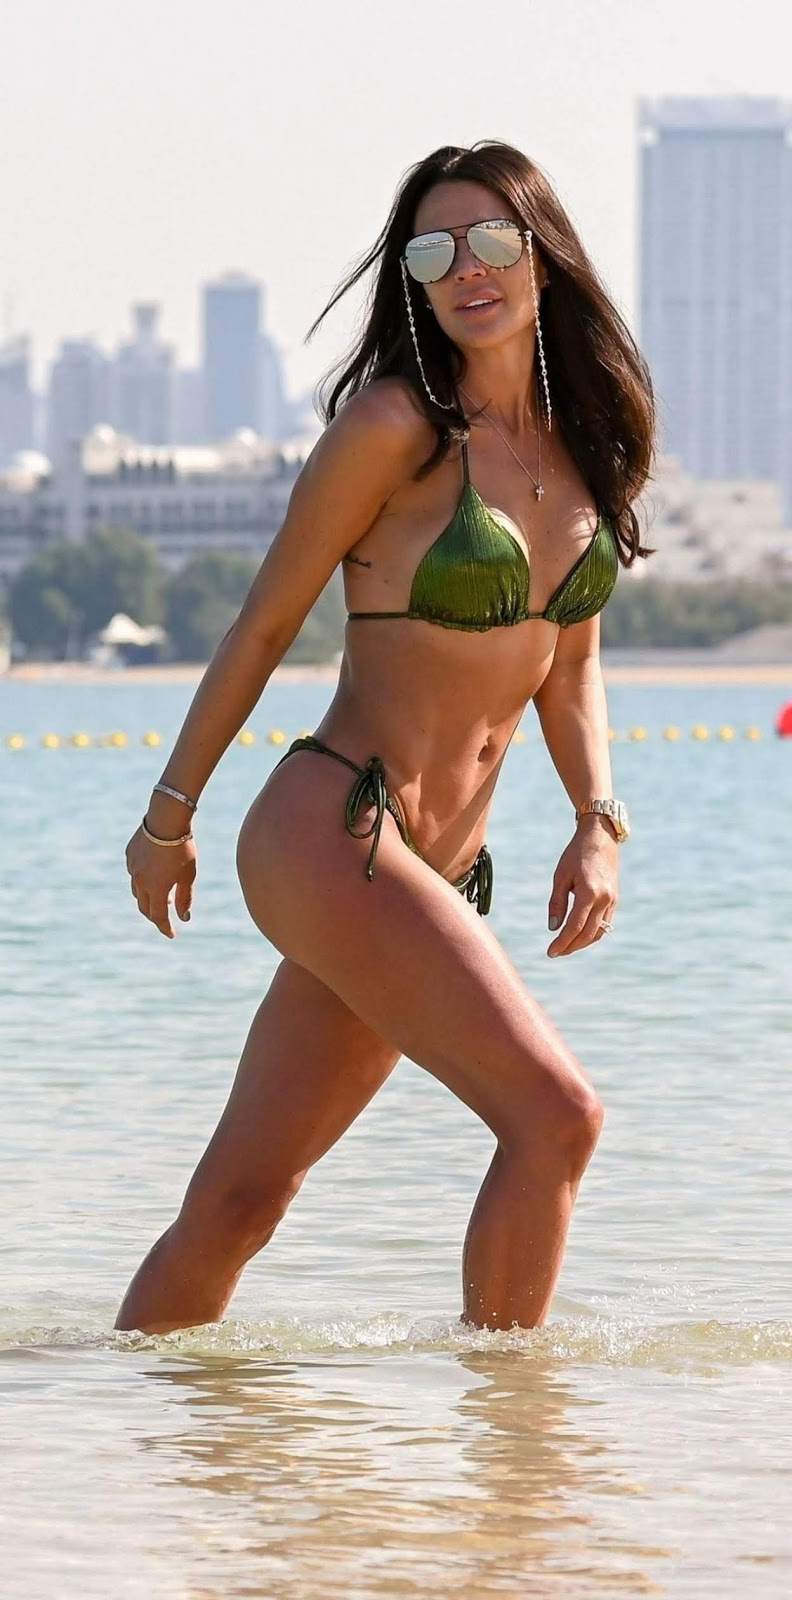 Danielle Lloyd in Green Bikini on Beach in Dubai